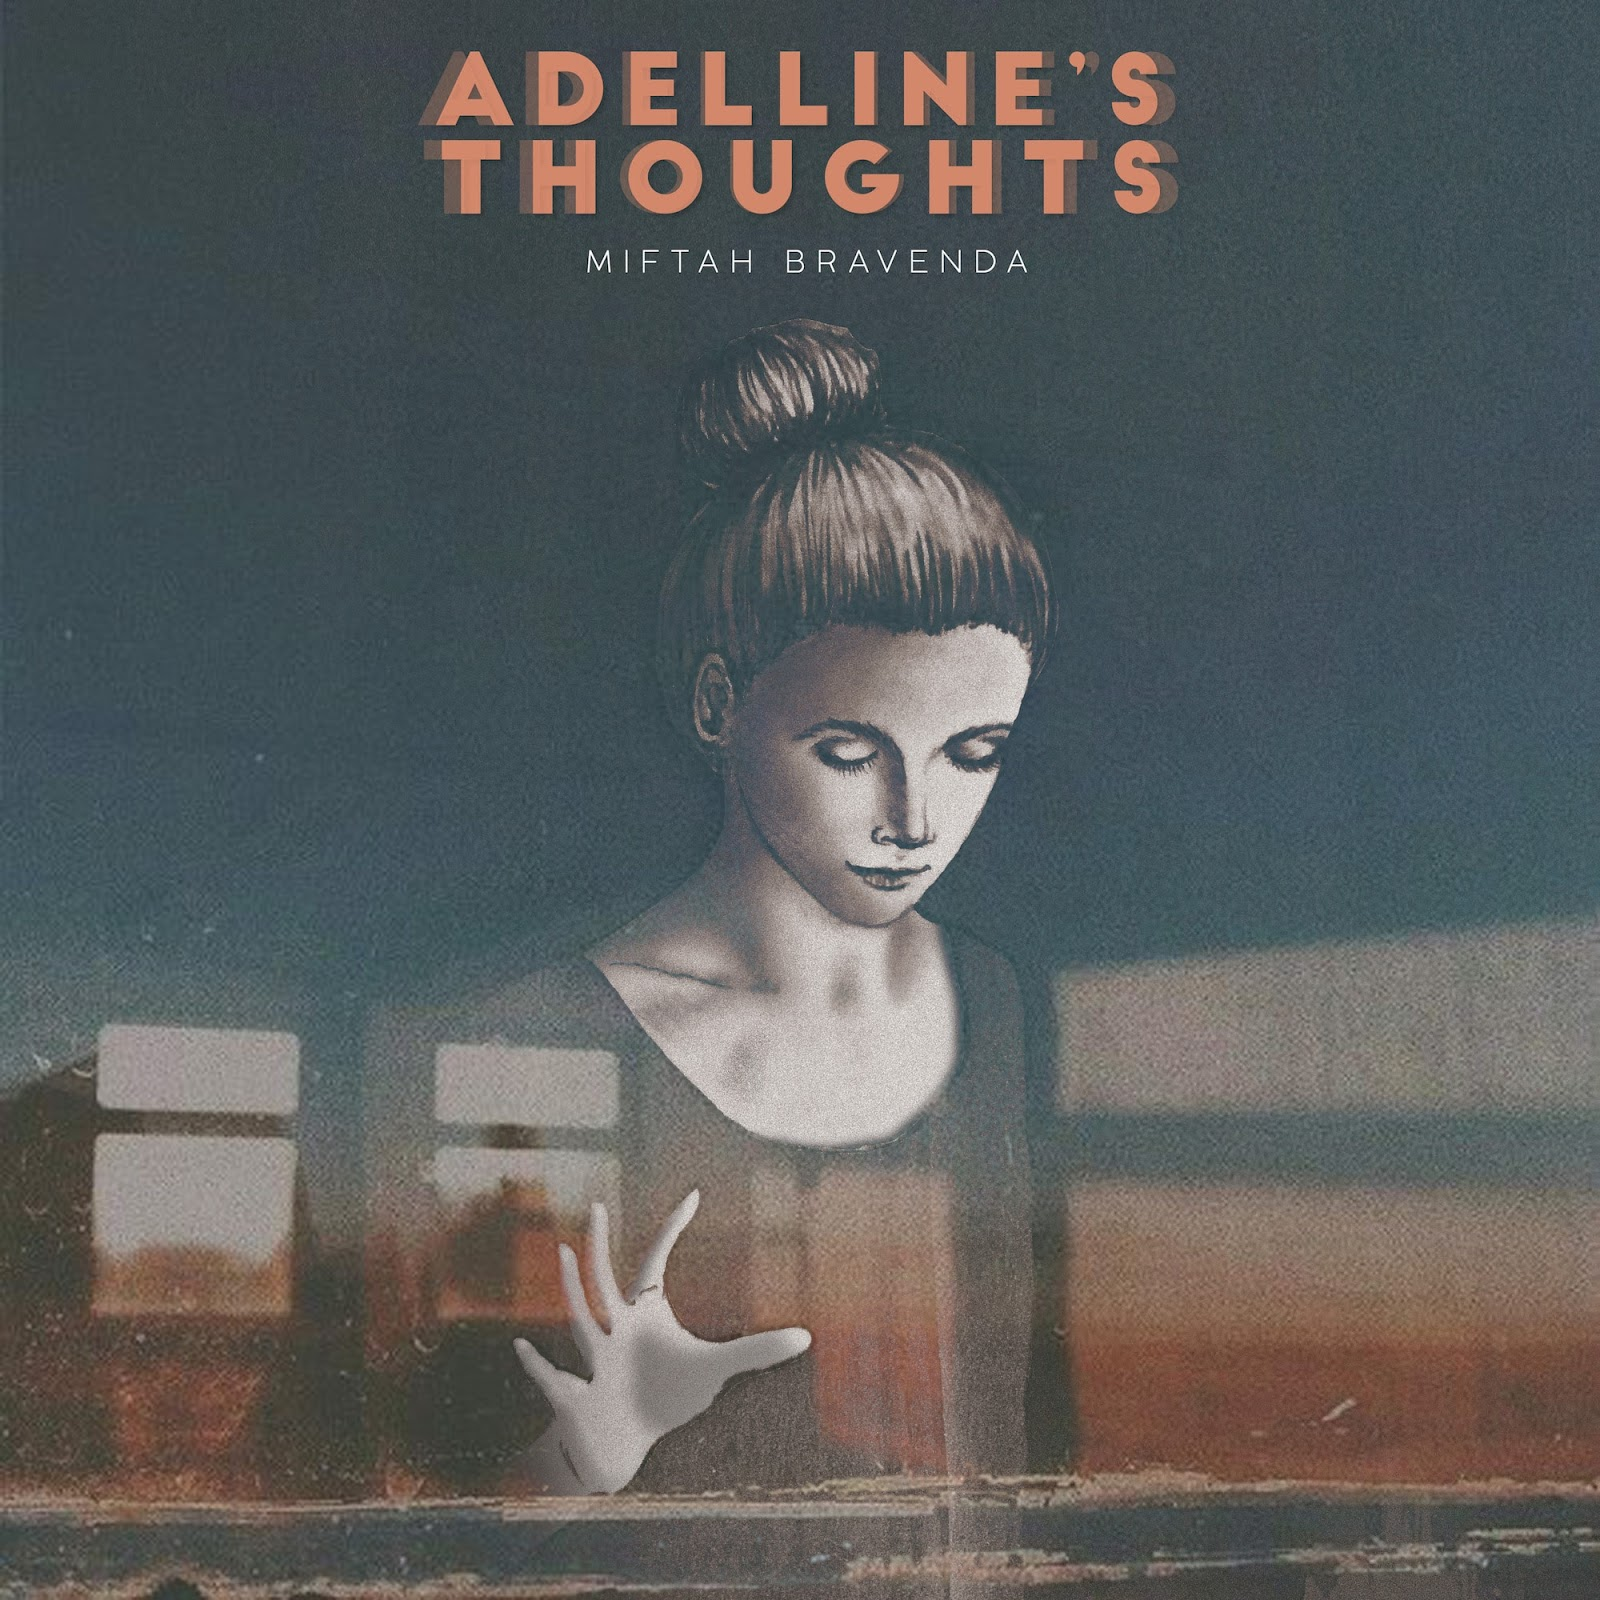 Miftah Bravenda - Adelline's Thoughts